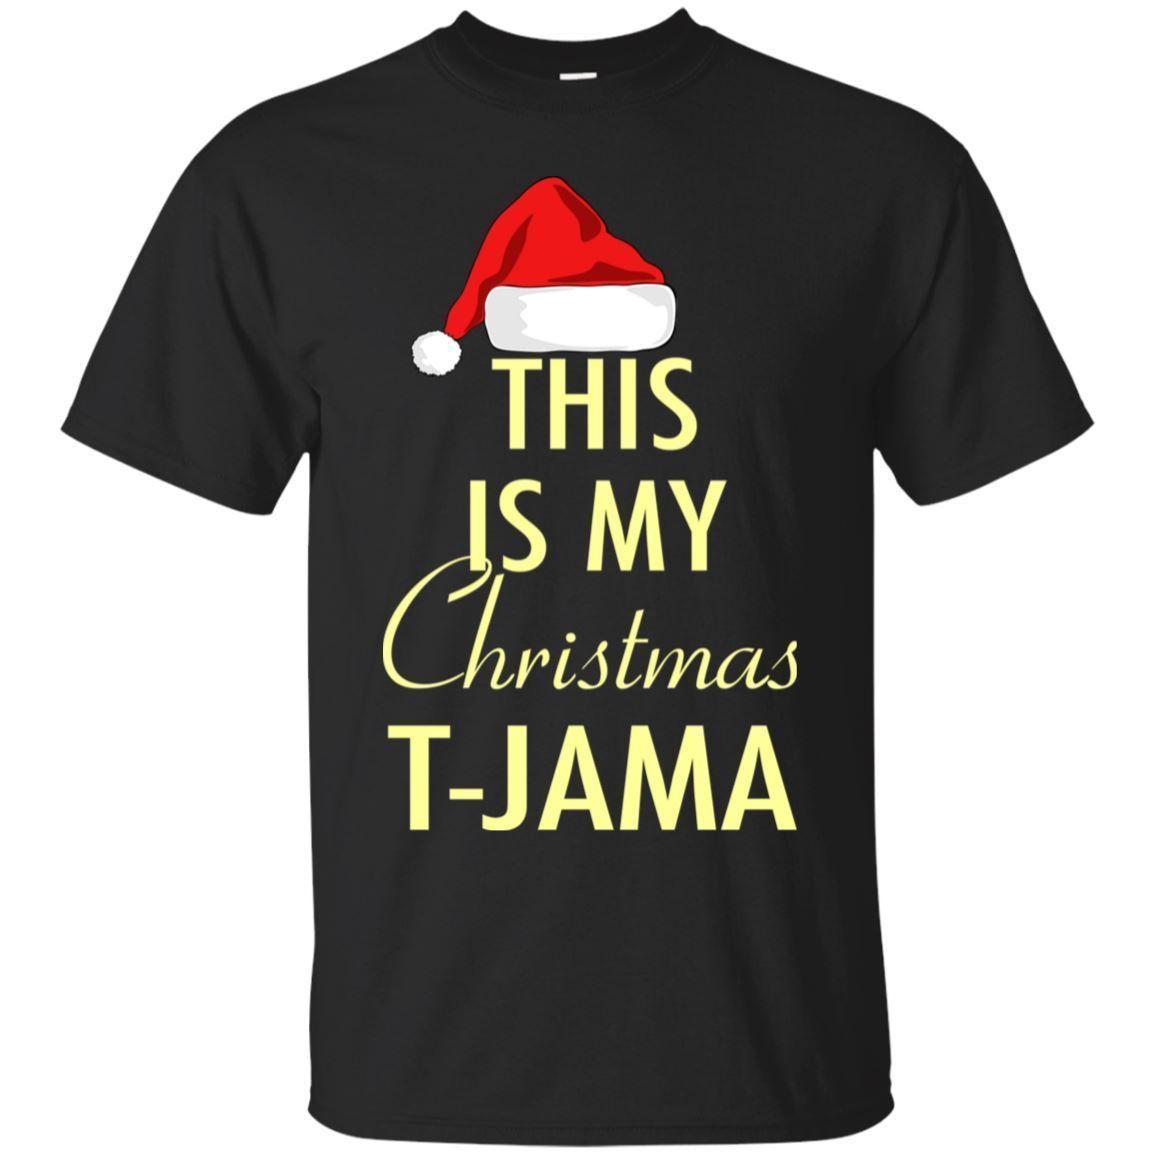 Family Christmas Shirts.Matching Family Christmas Shirt Xmas Funny Holidays Gift Black Navy T Shirtfunny Free Shipping Unisex Casual Tshirt